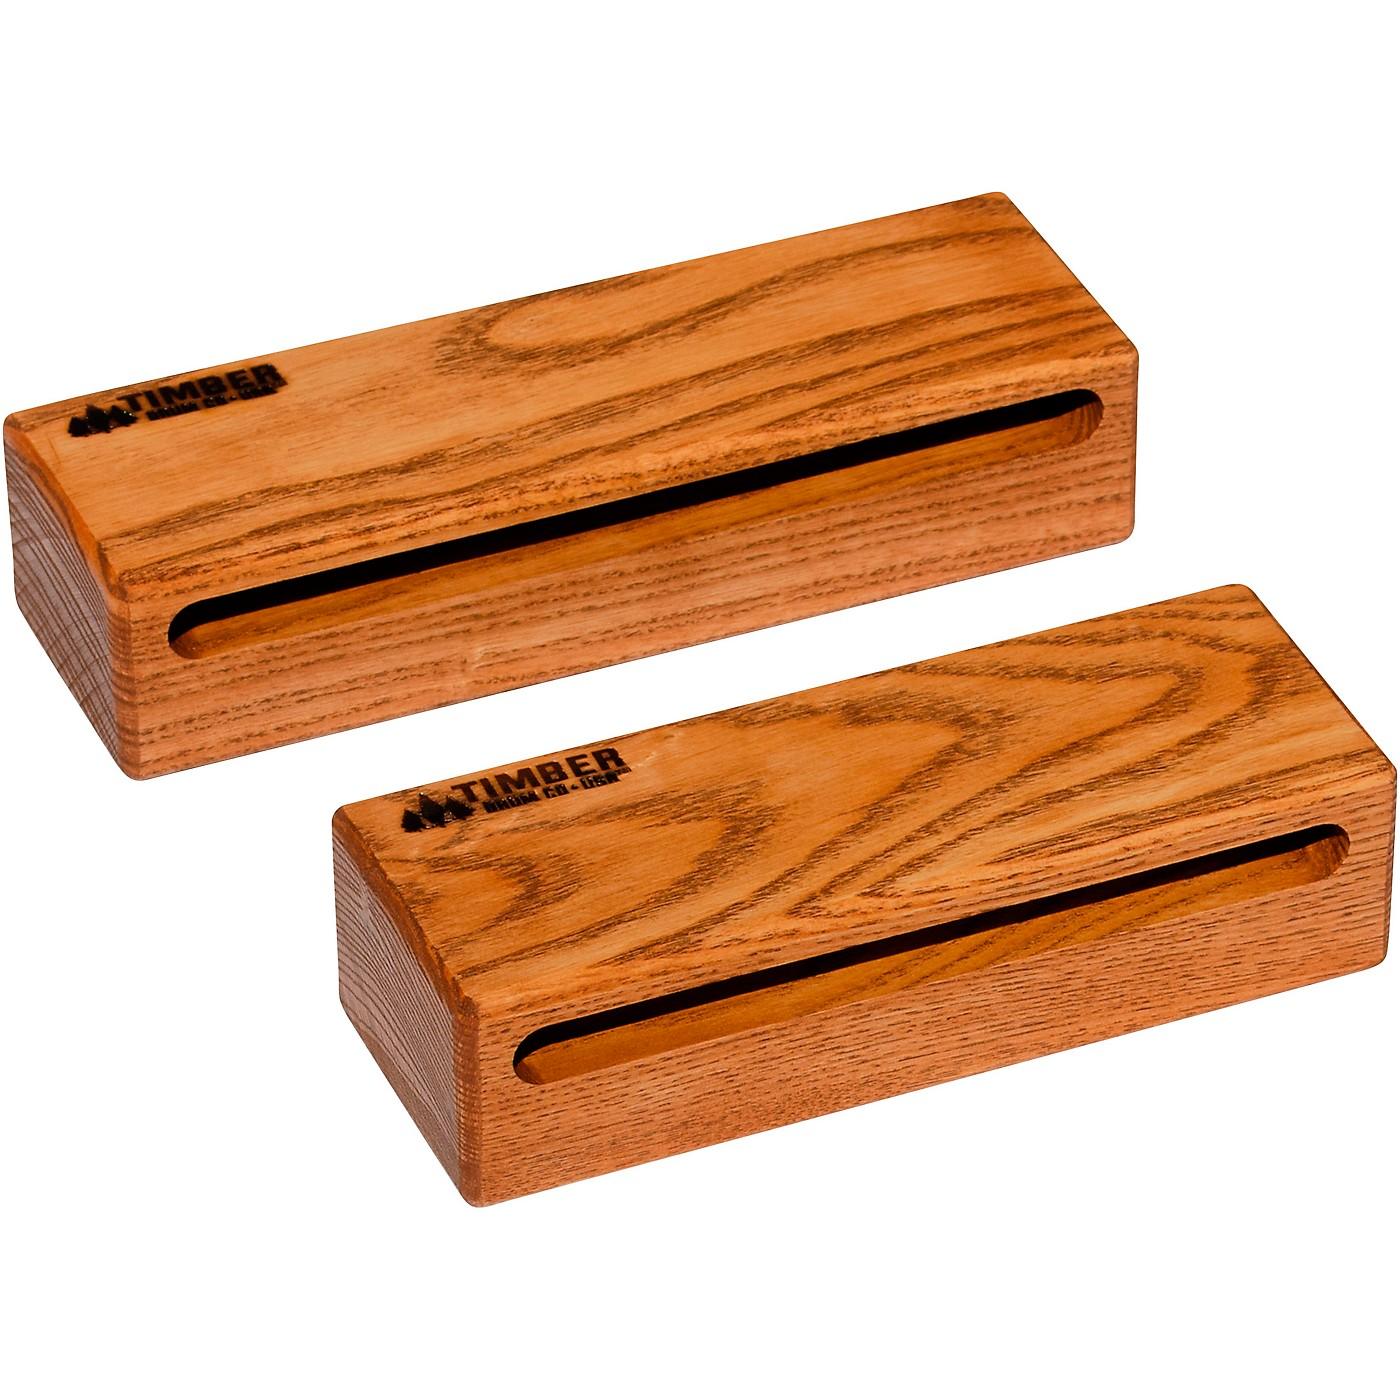 Timber Drum Company American Hardwood Block Pack thumbnail